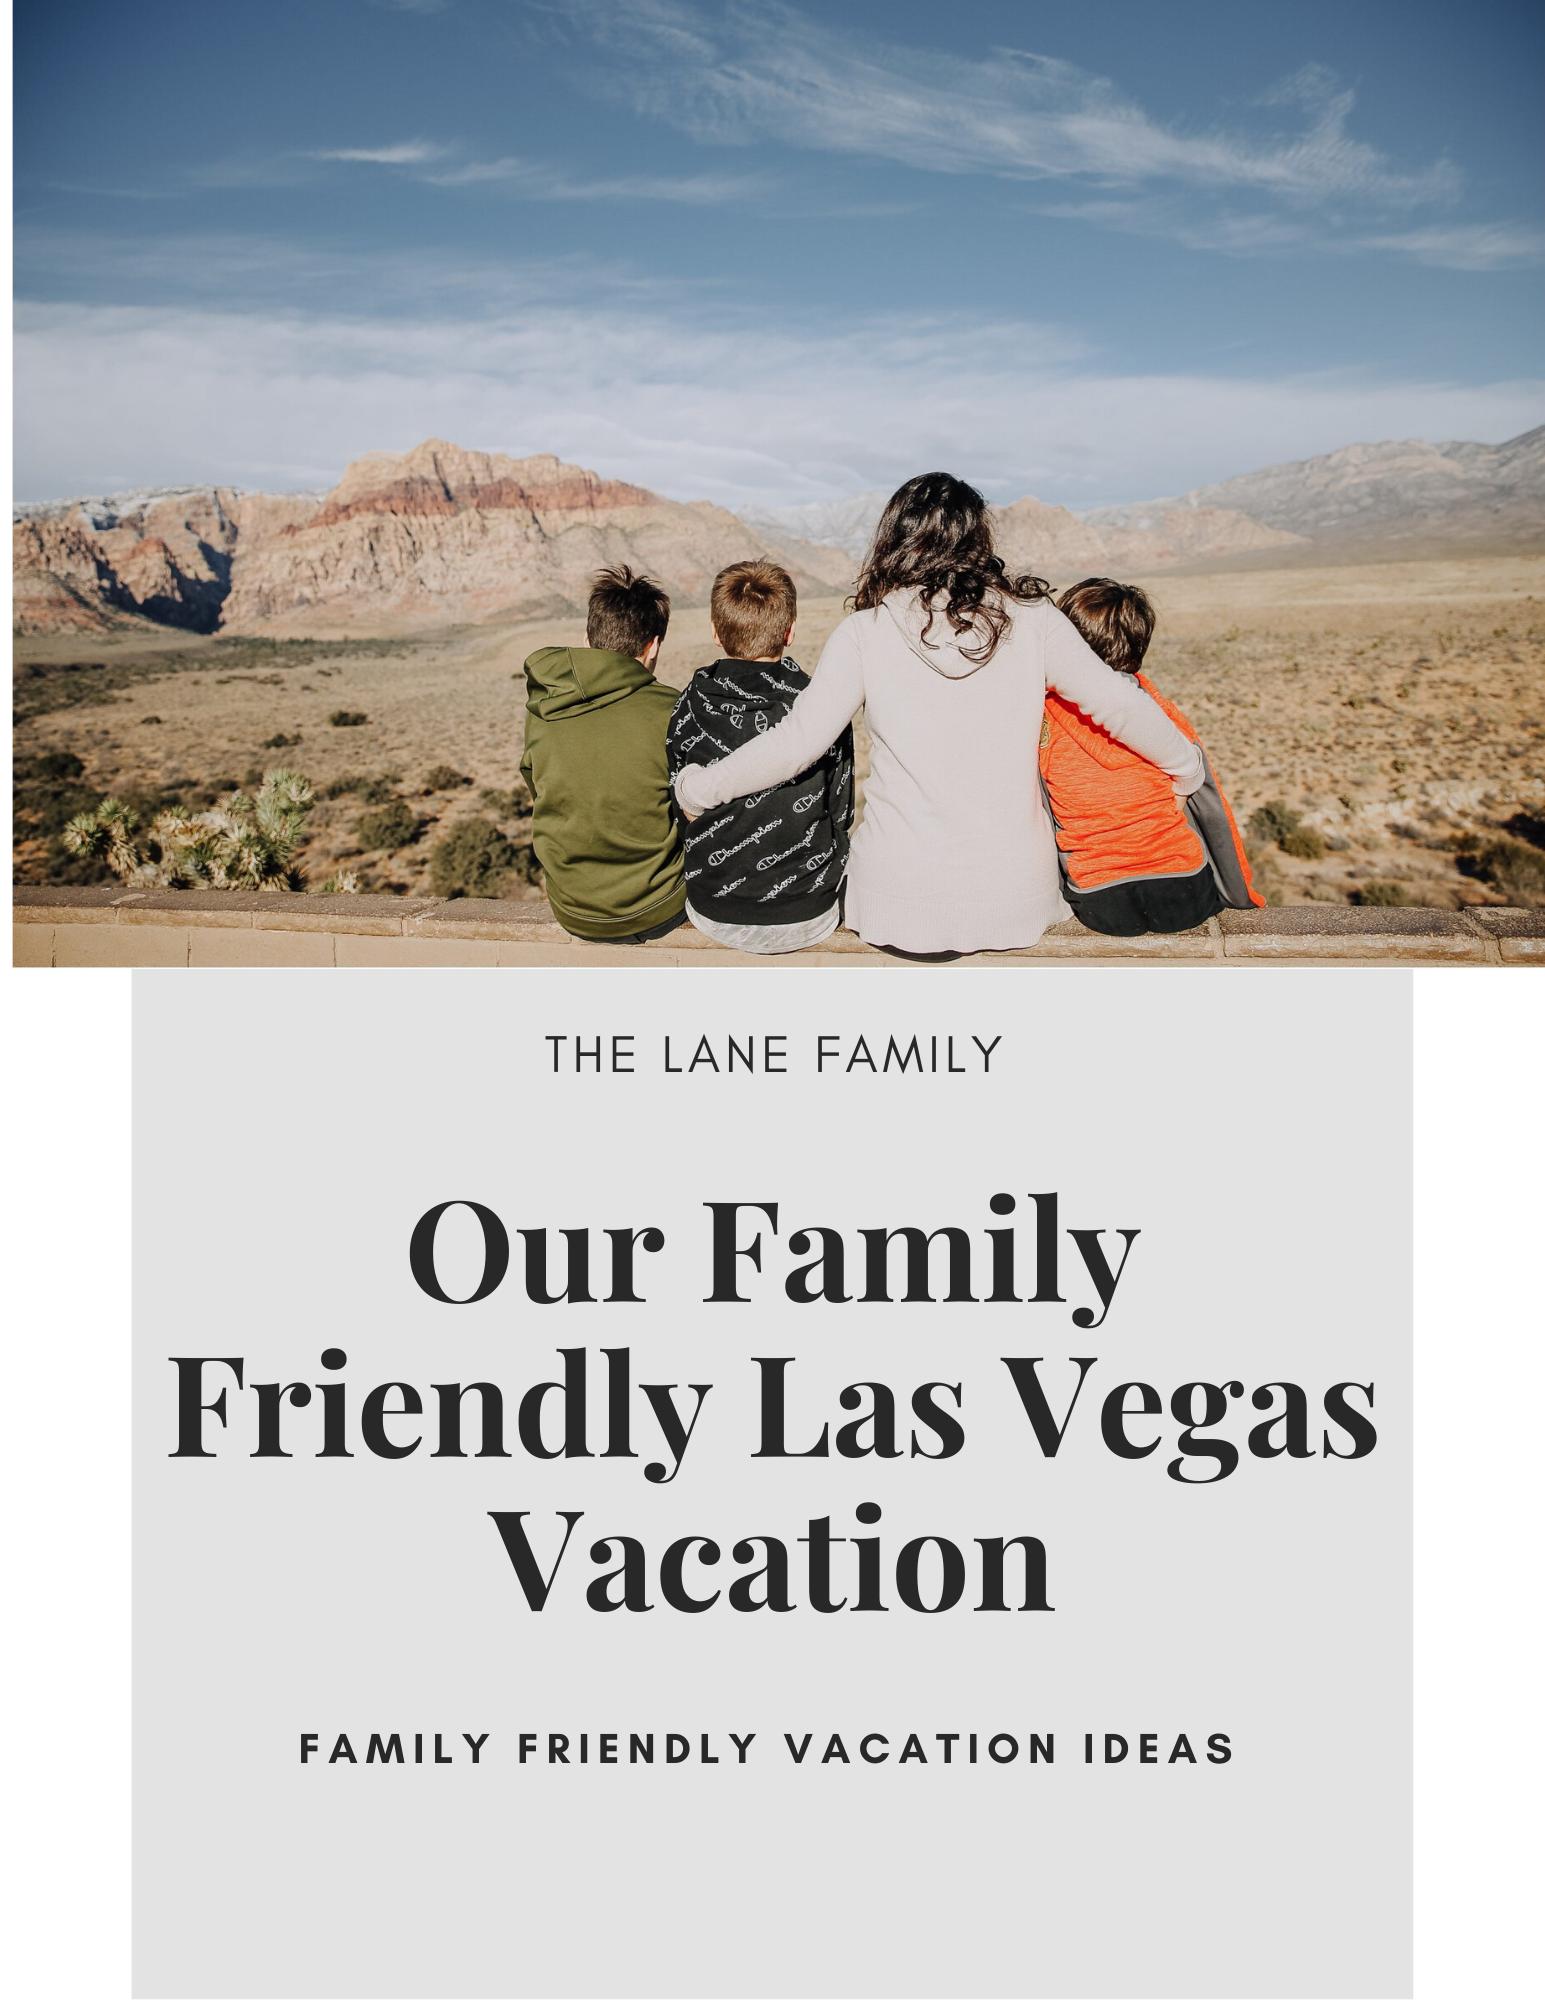 Las Vegas Family Friendly Vacation Inspiration - Our Family Vacation to Las Vegas - Las Vegas Family Vacation Ideas - Family Vacation Ideas  Blog by Jessica Lane, Mom + Wedding Photographer and Blogger #traveladdict #familyadventures #familyvacation